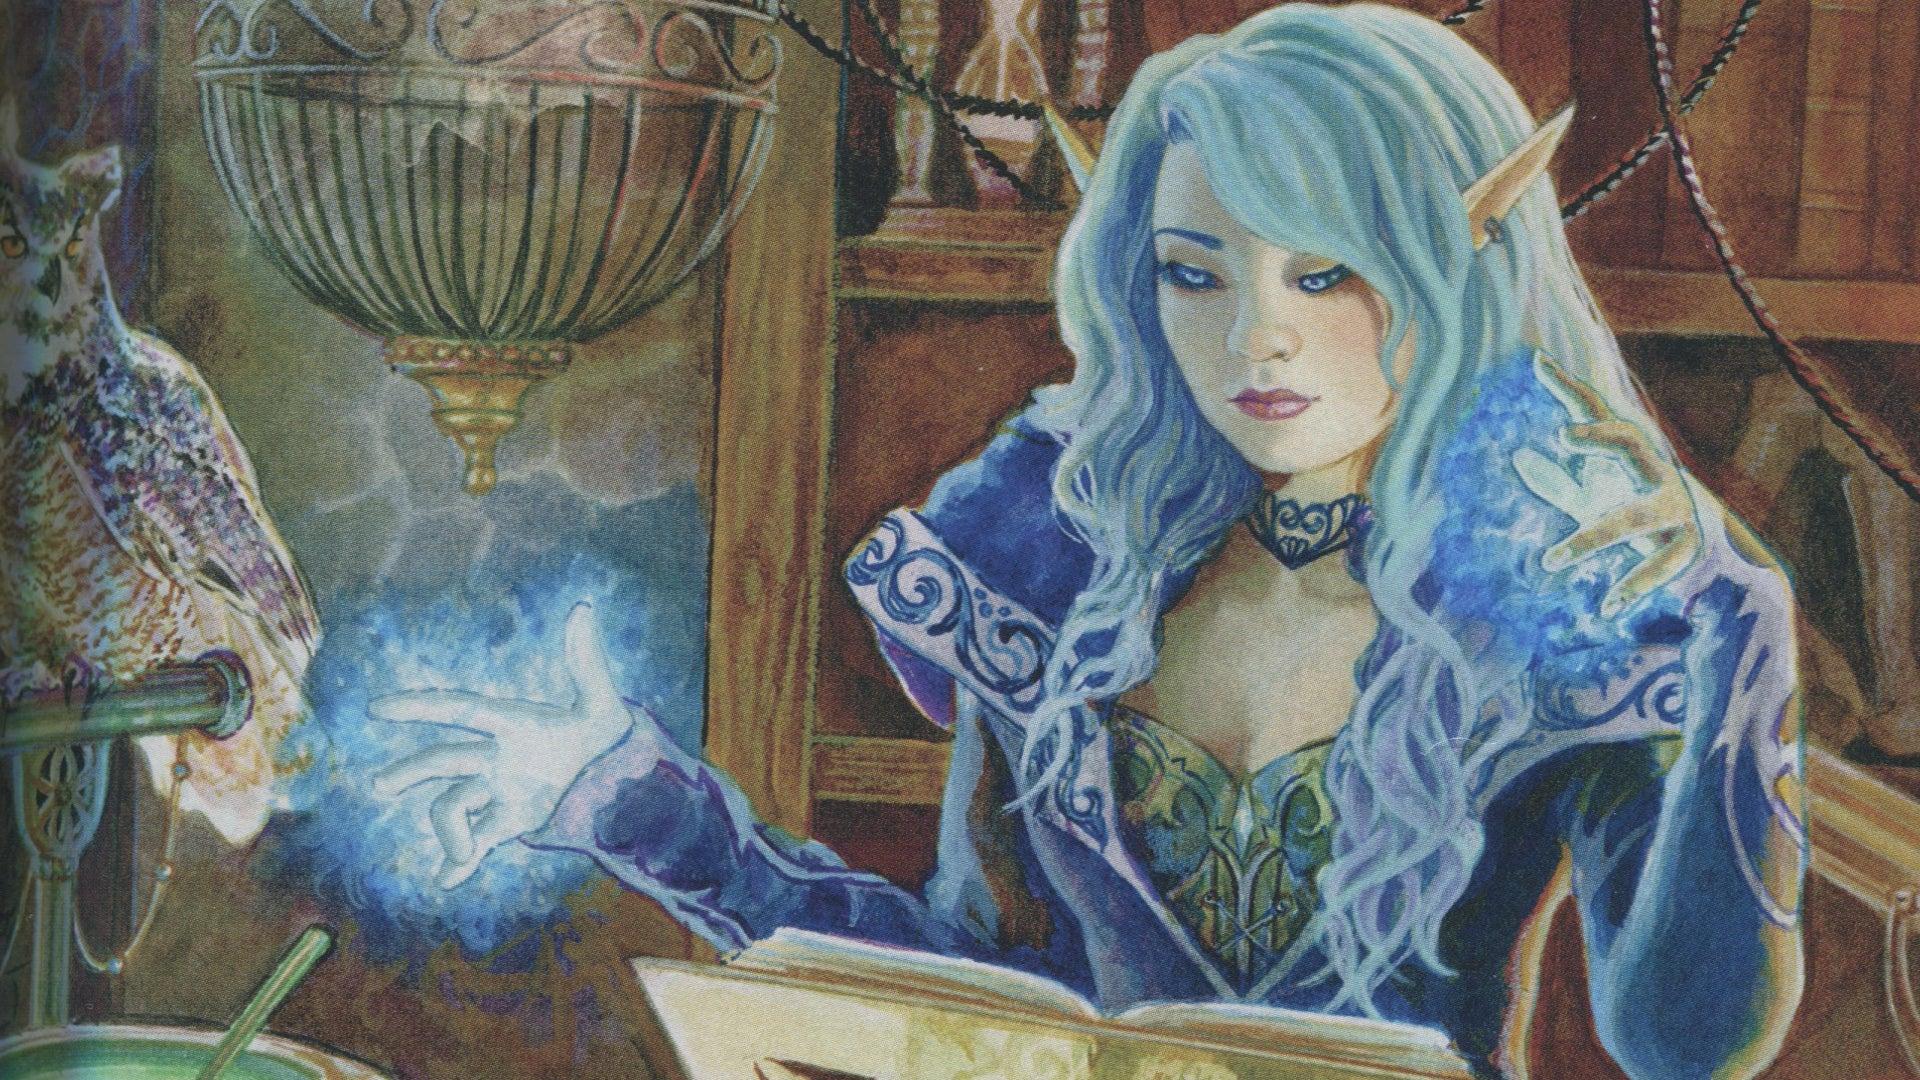 Dungeons & Dragons 5e Players Handbook artwork 7